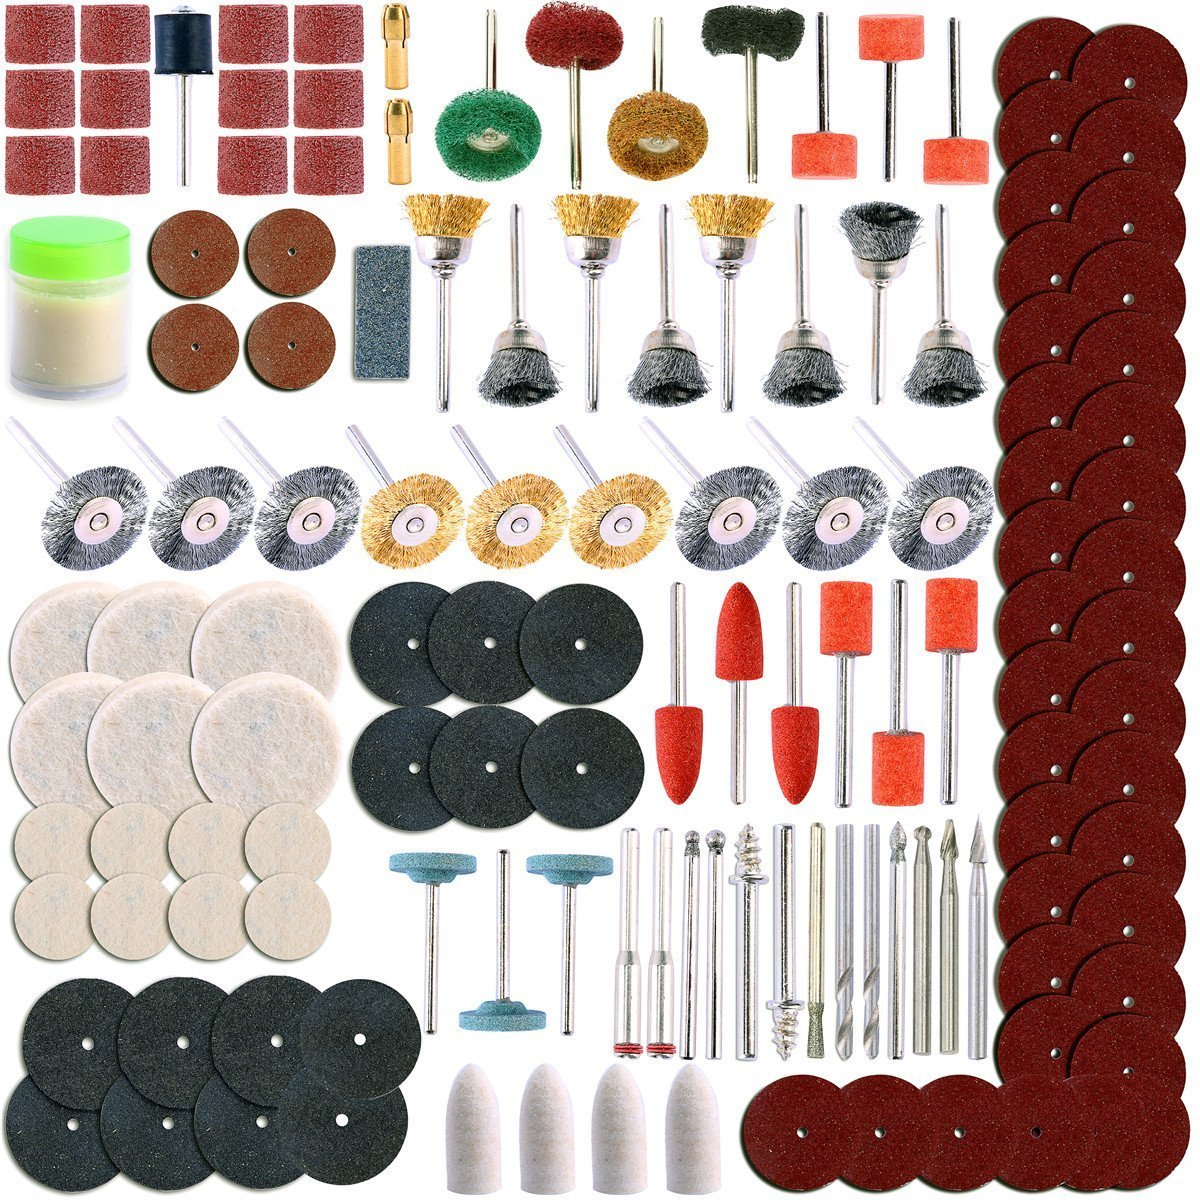 350pc Rotary Tool Accessory Set For Sanding, Polishing, Dremel Grinding freebirdtrading